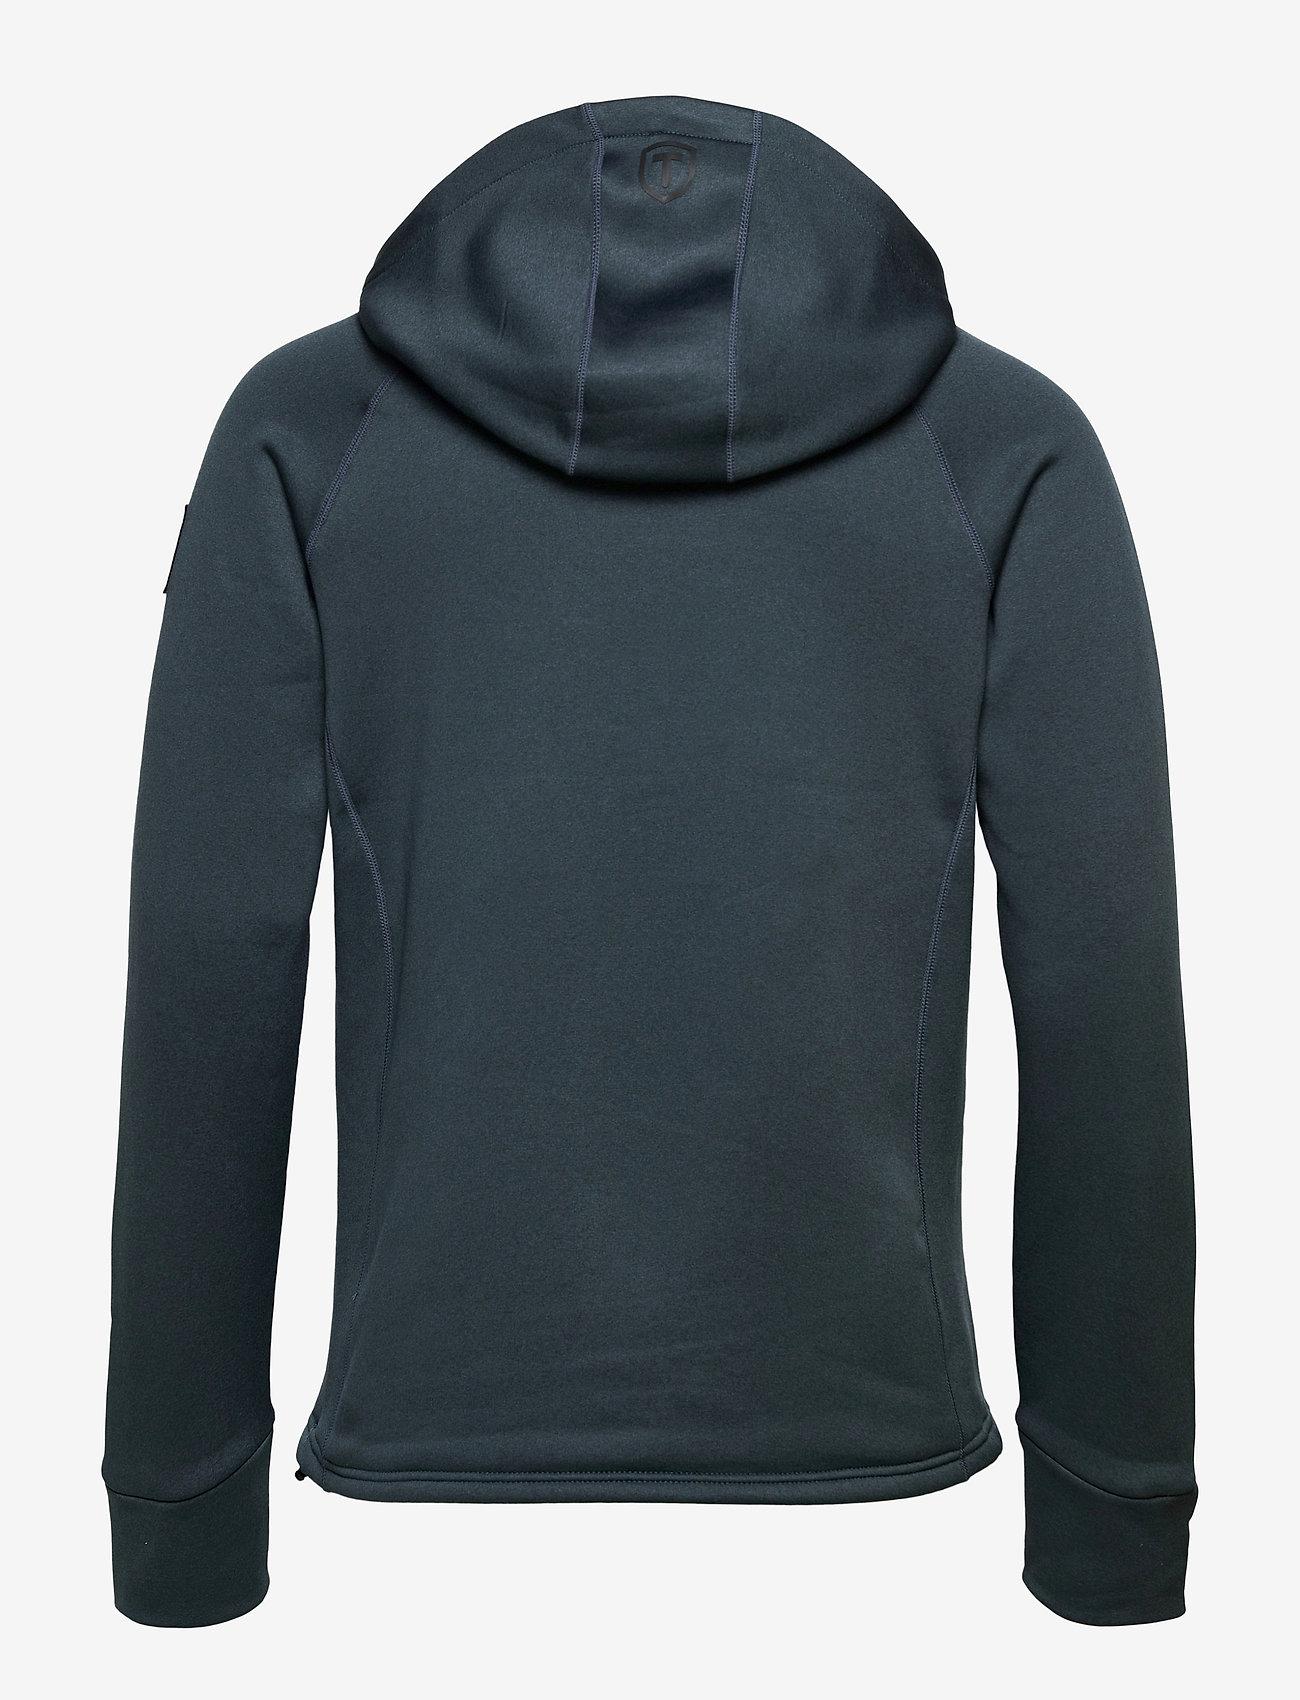 Tenson - Icon Hoodie M - basic-sweatshirts - dark blue - 1